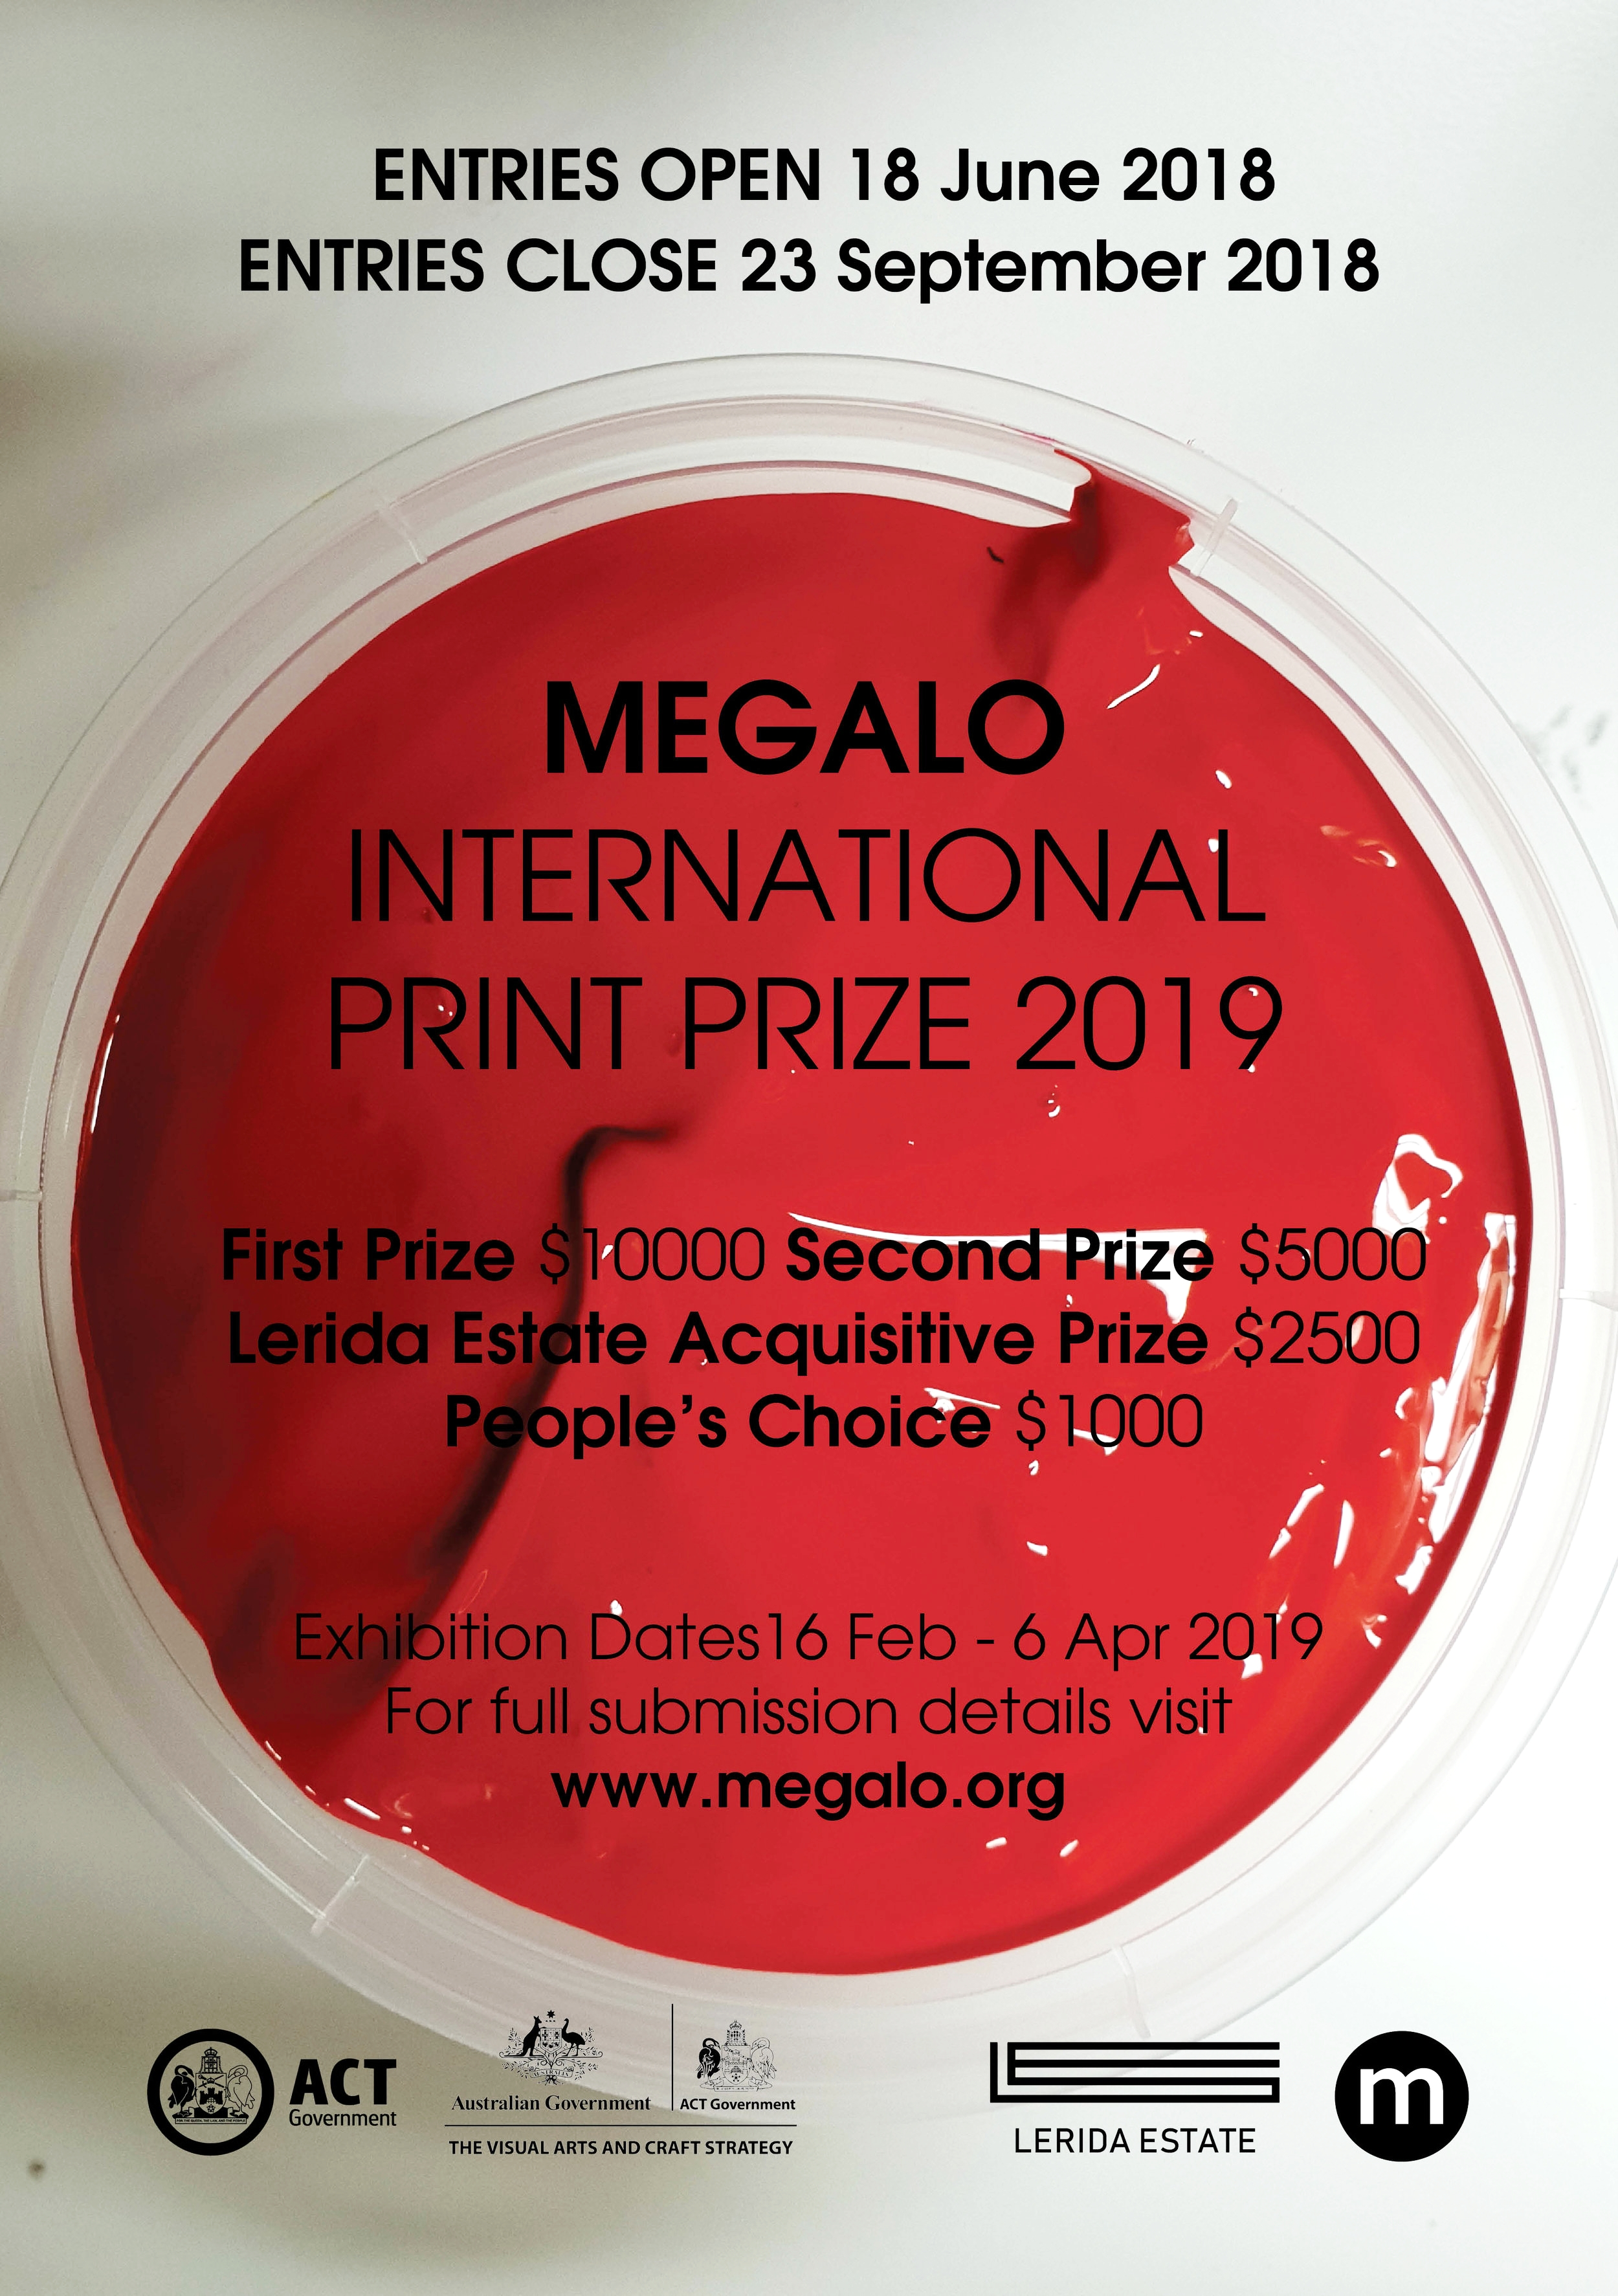 Megalo_Print_Prize_flyer.jpg